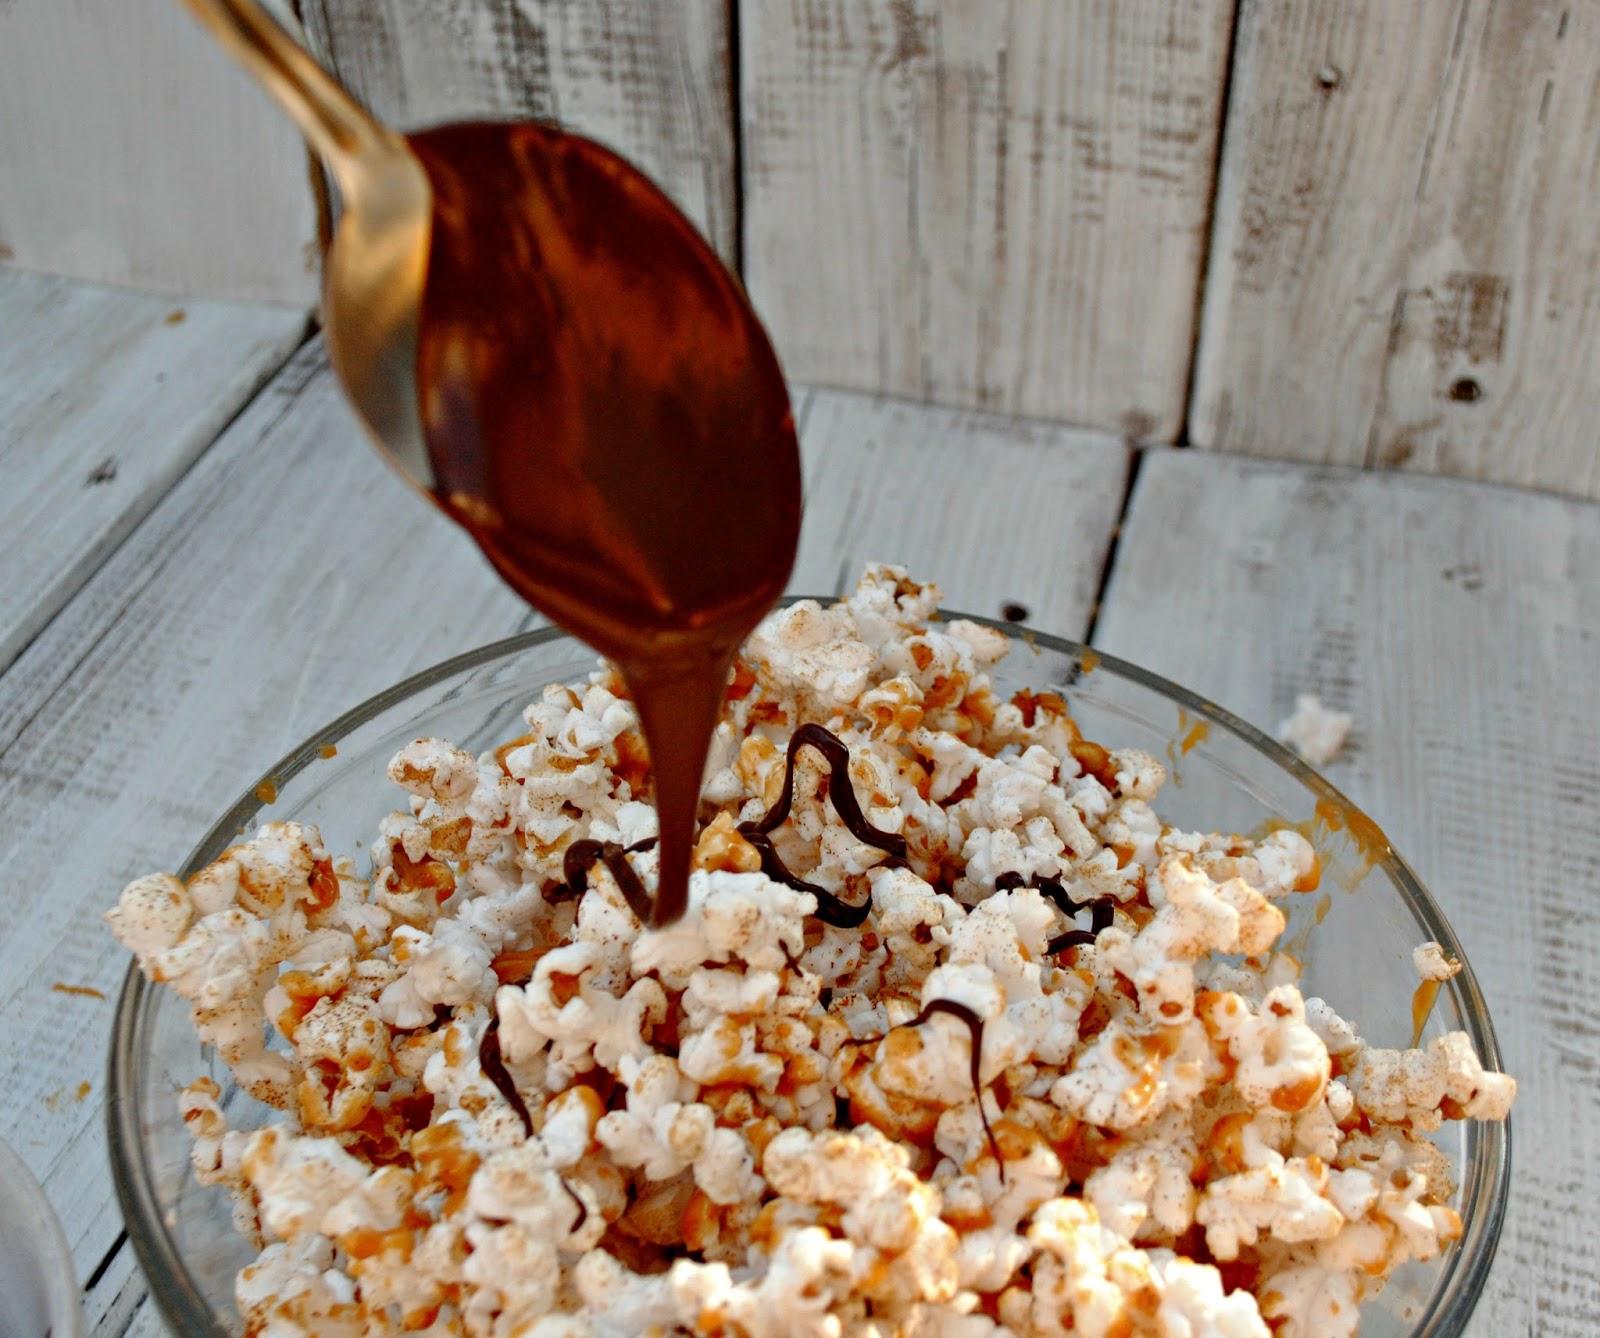 Drizzle Chocolate on Popcorn